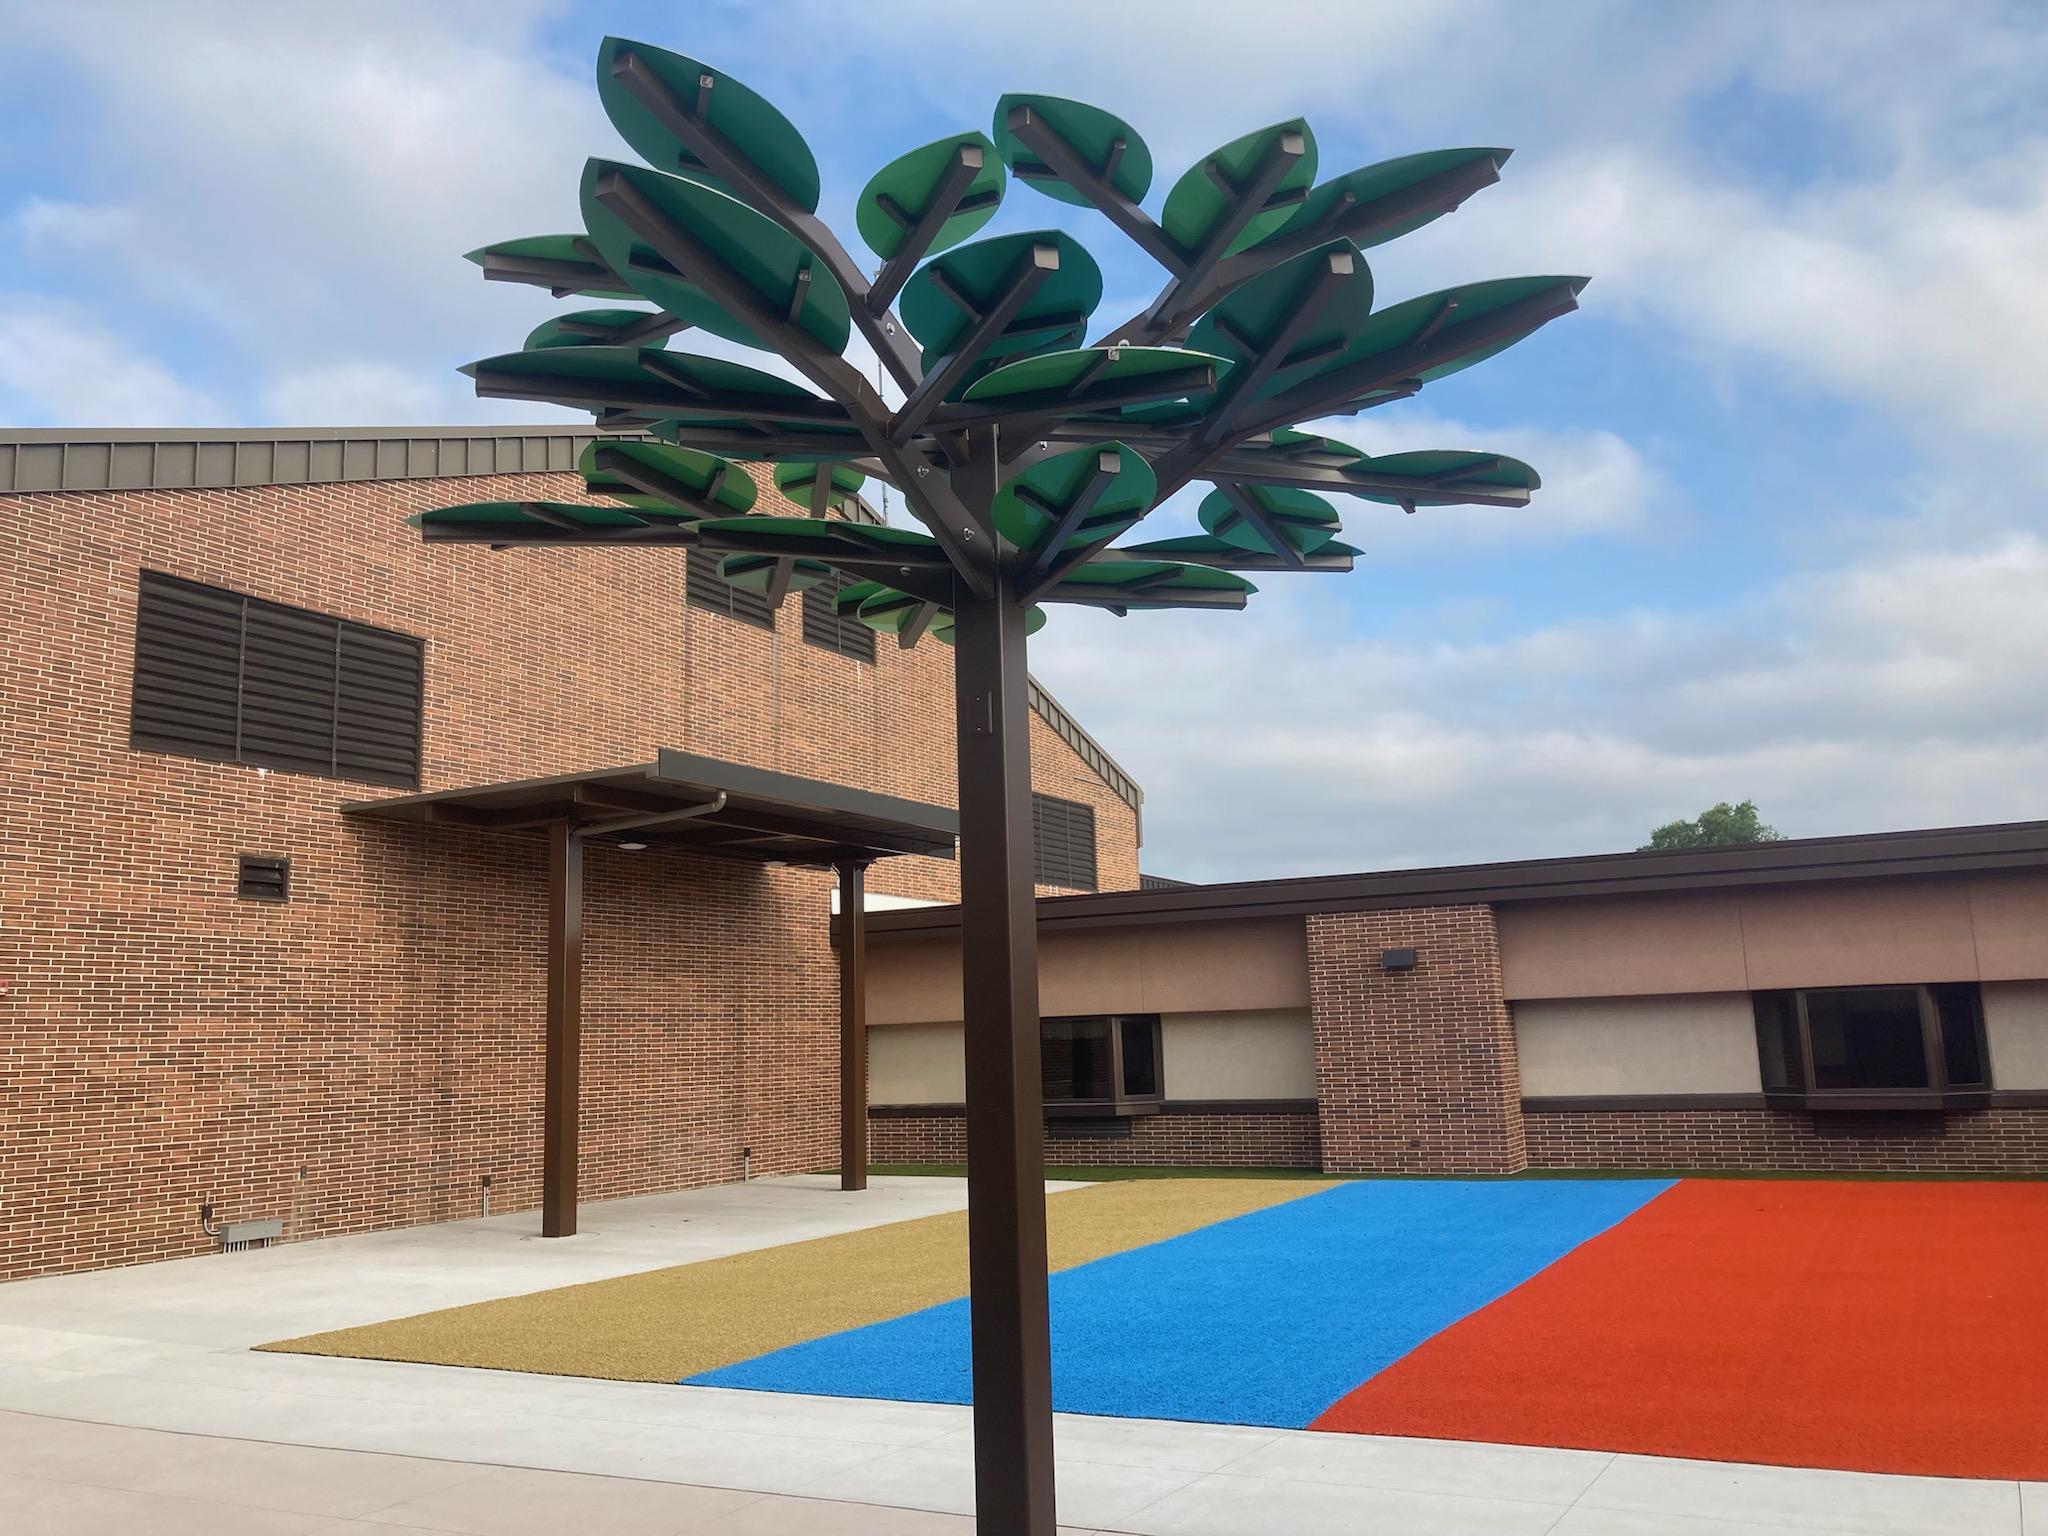 ALPOLIC MCM Leaves Provide Shade in Elementary School Courtyard